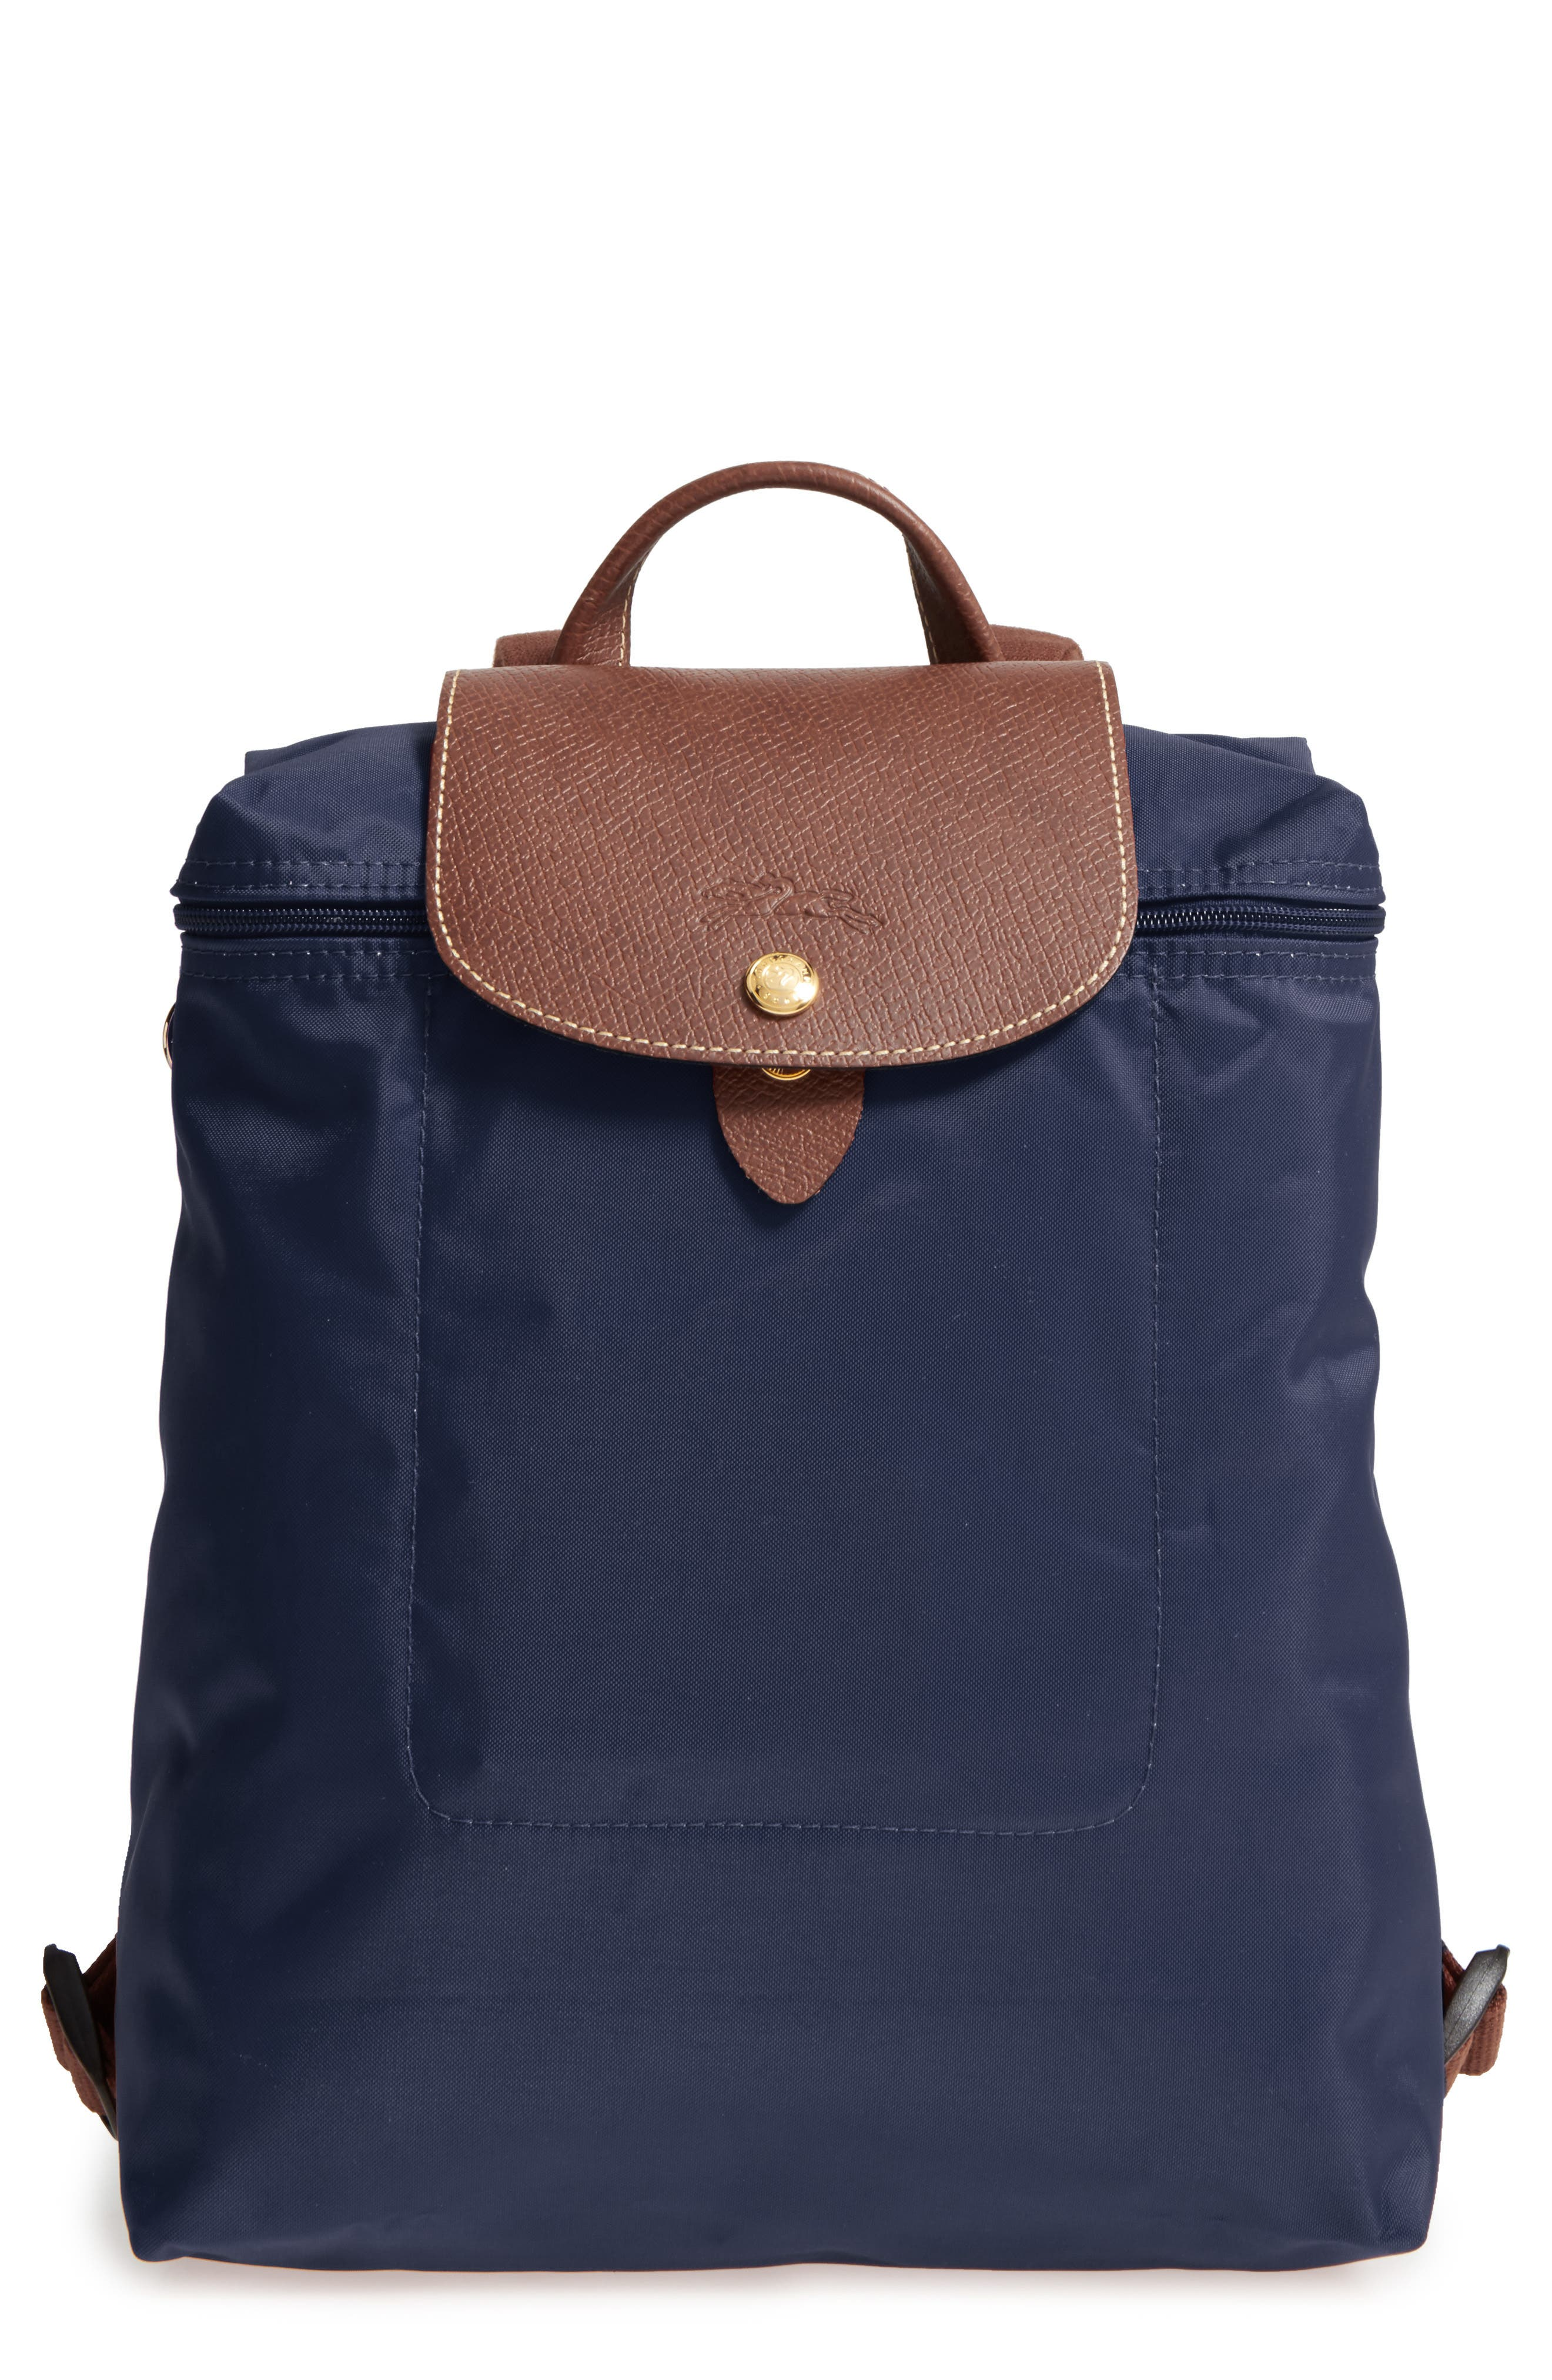 581757618da25e Handbags & Wallets for Women | Nordstrom